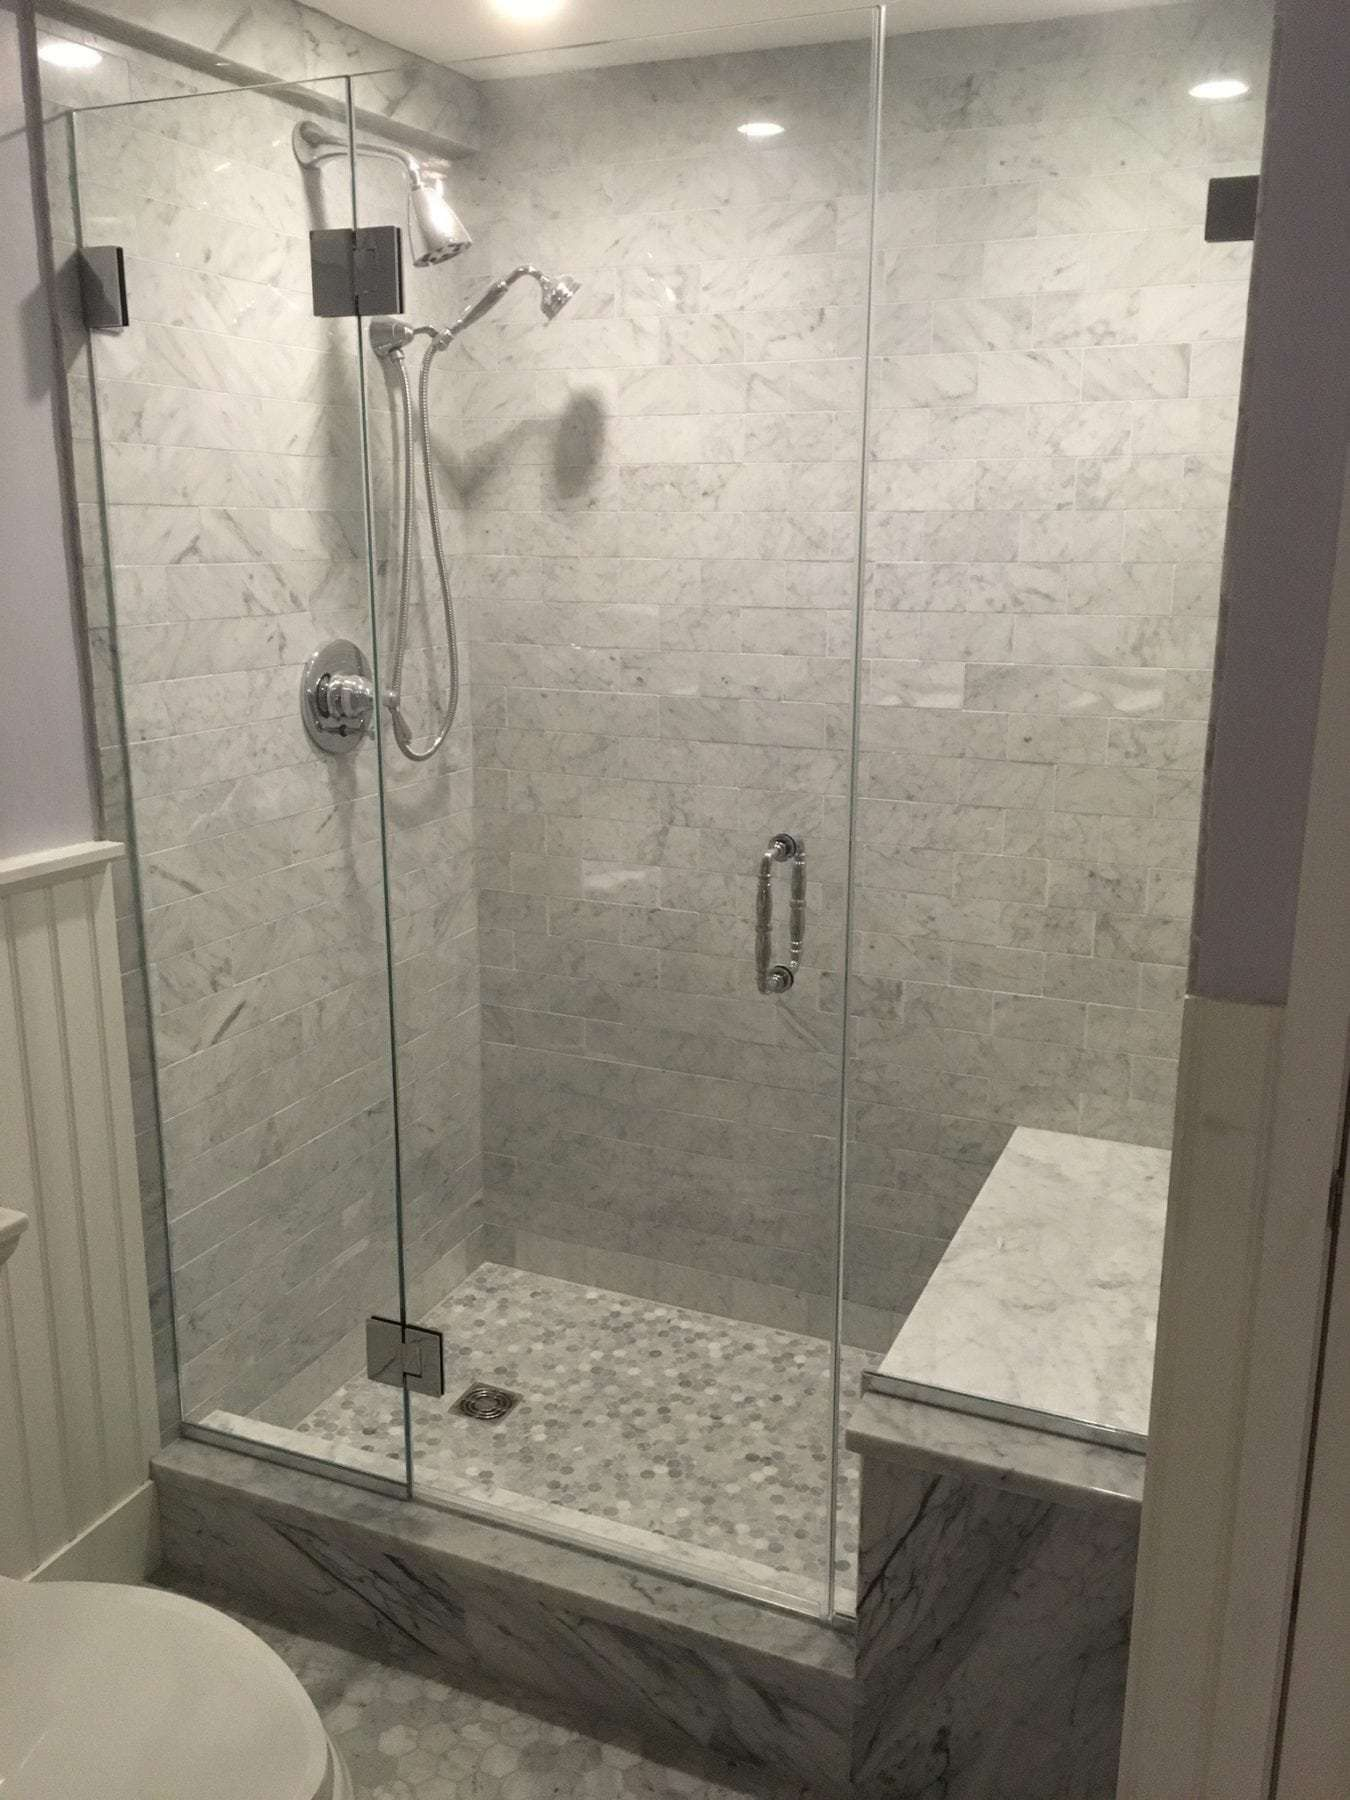 Frameless Shower Enclosure Sidelights Either Side And Door